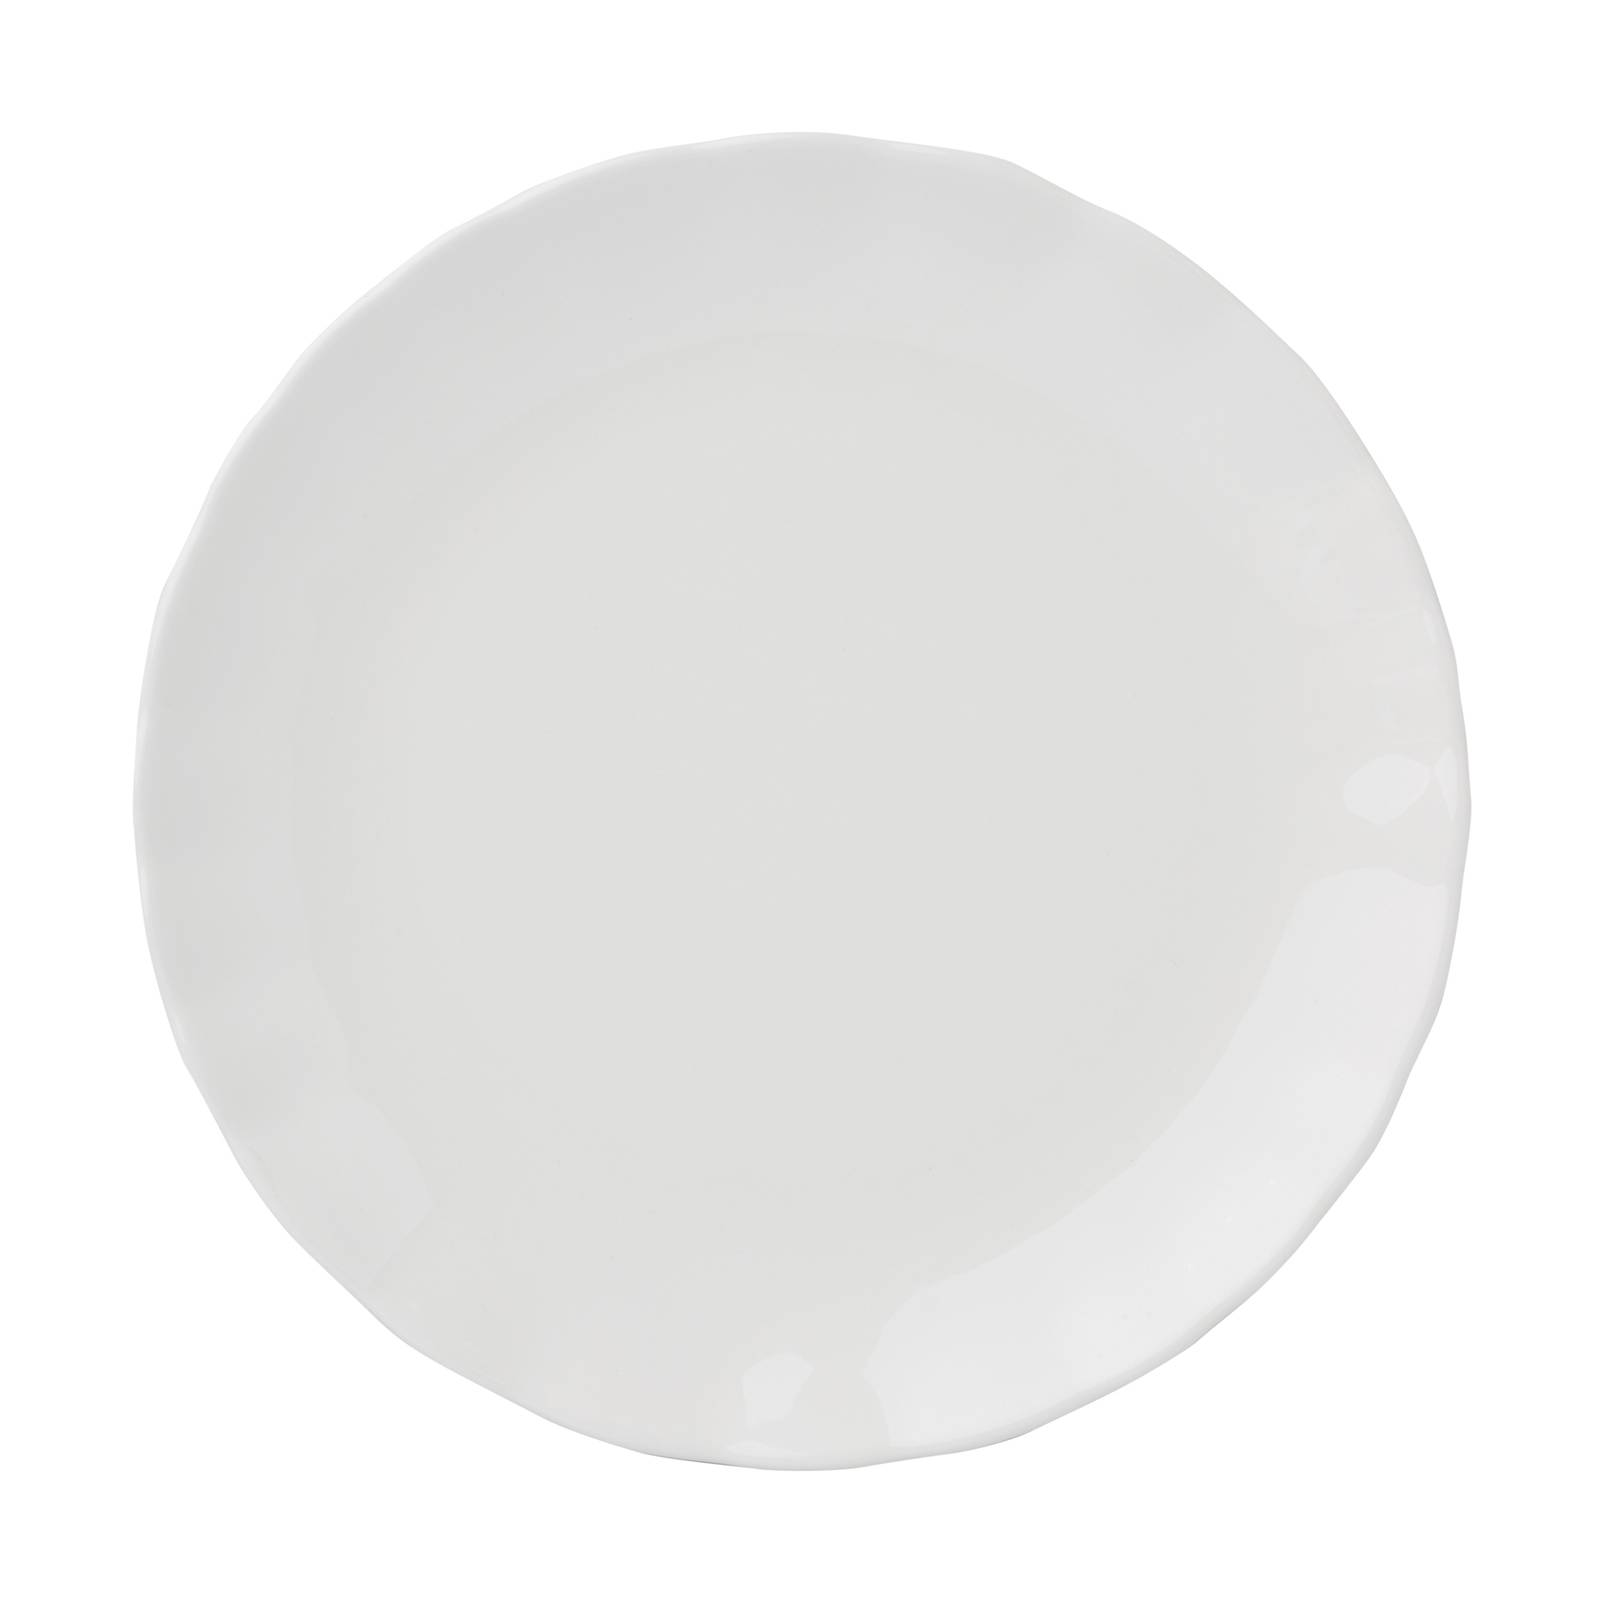 Talerz obiadowe Diana Rustic Cream 27 cm AMBITION